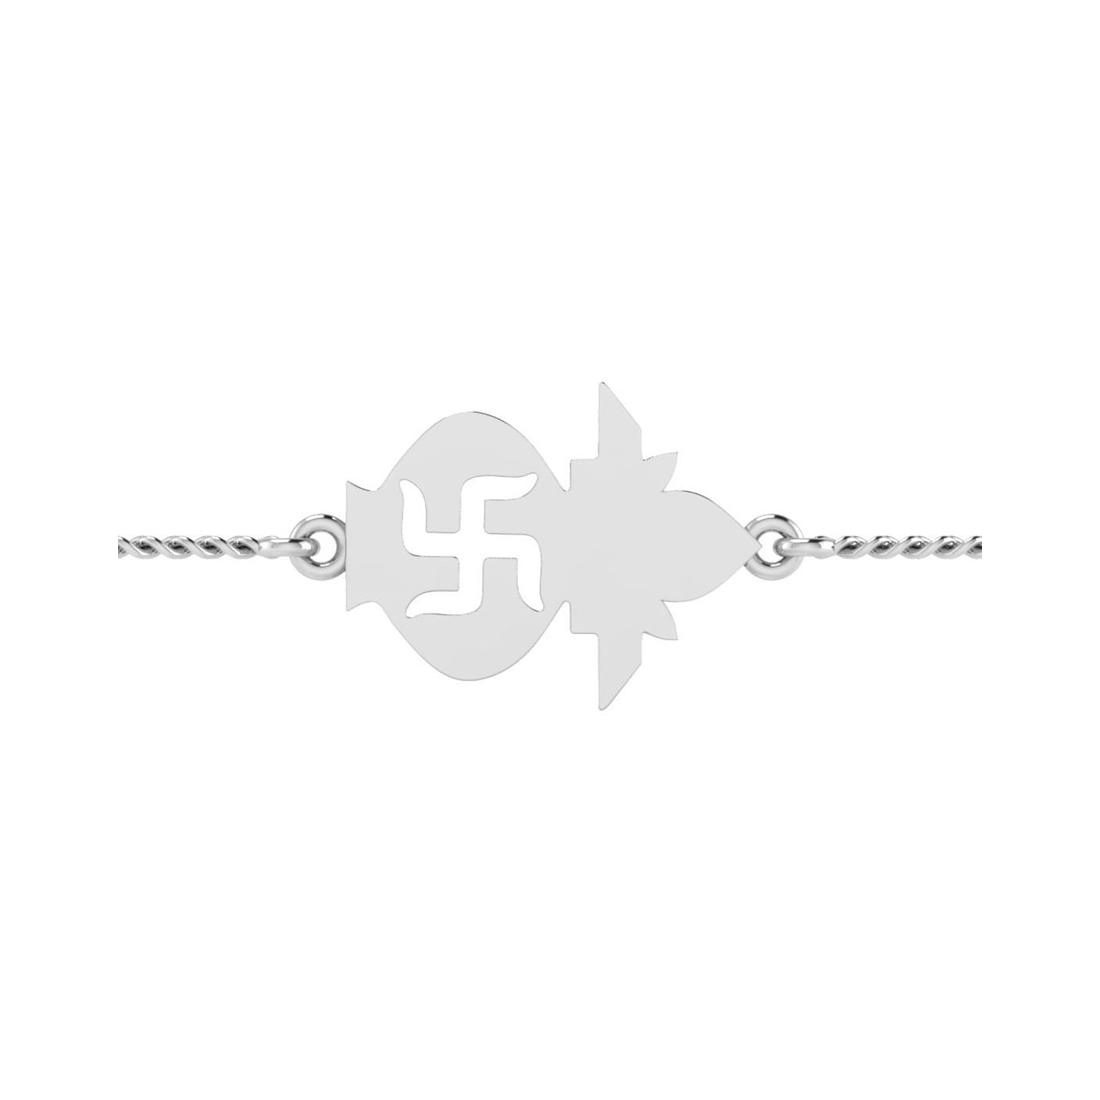 ISKI USKI 925 Silver Rakhi for Brother B-0008WRCSE